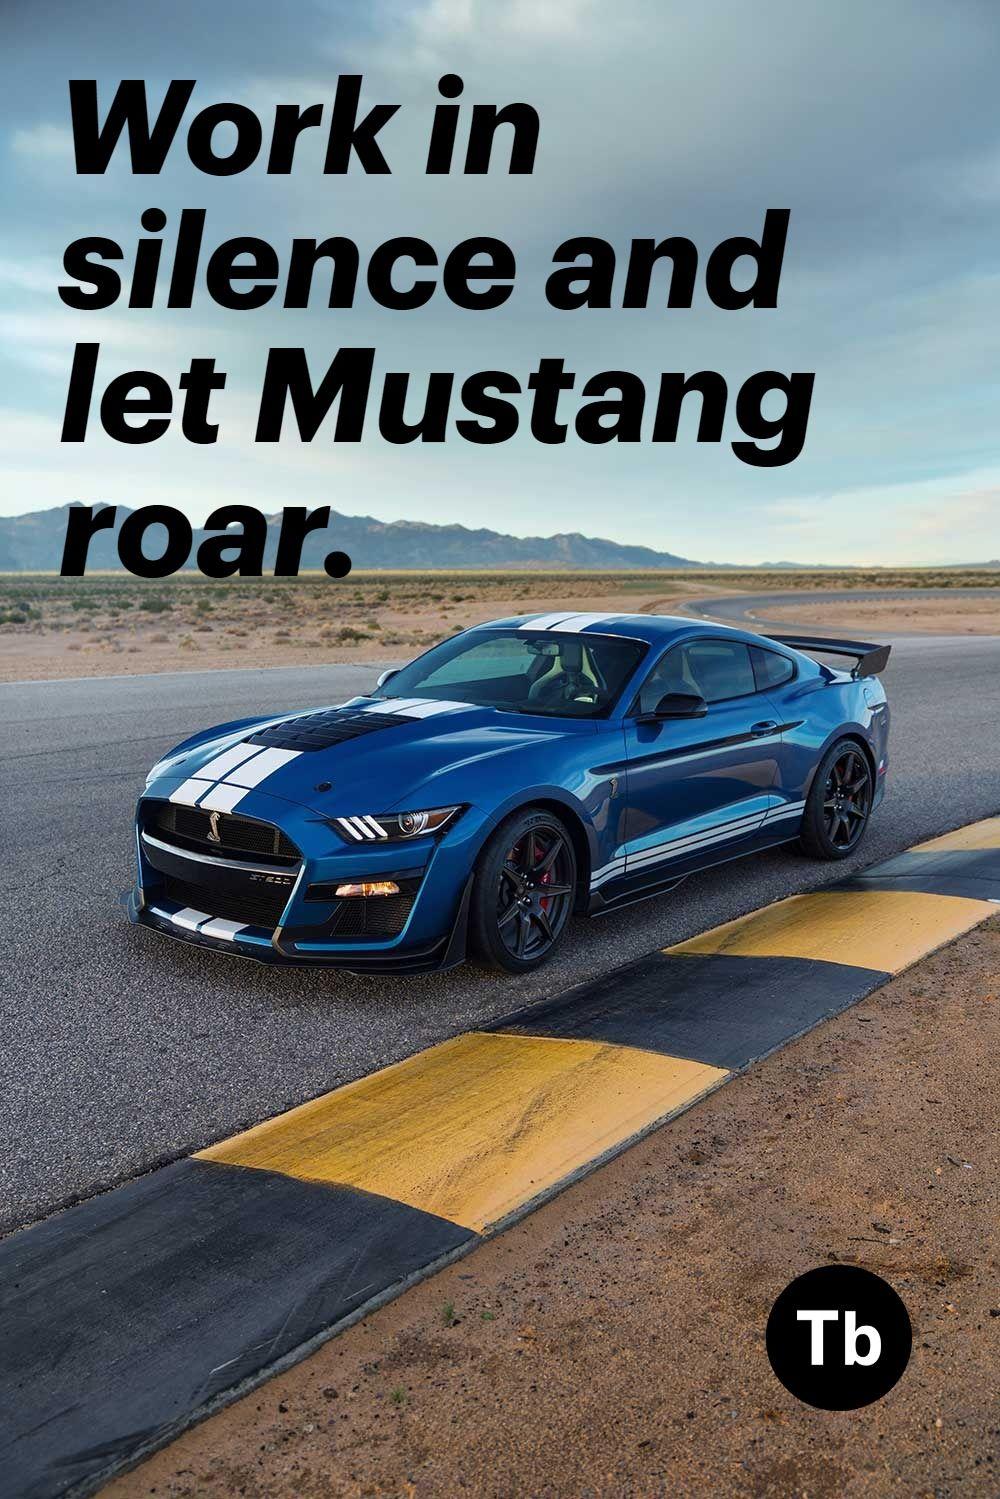 263 car quotes status sayings for car lovers car guy